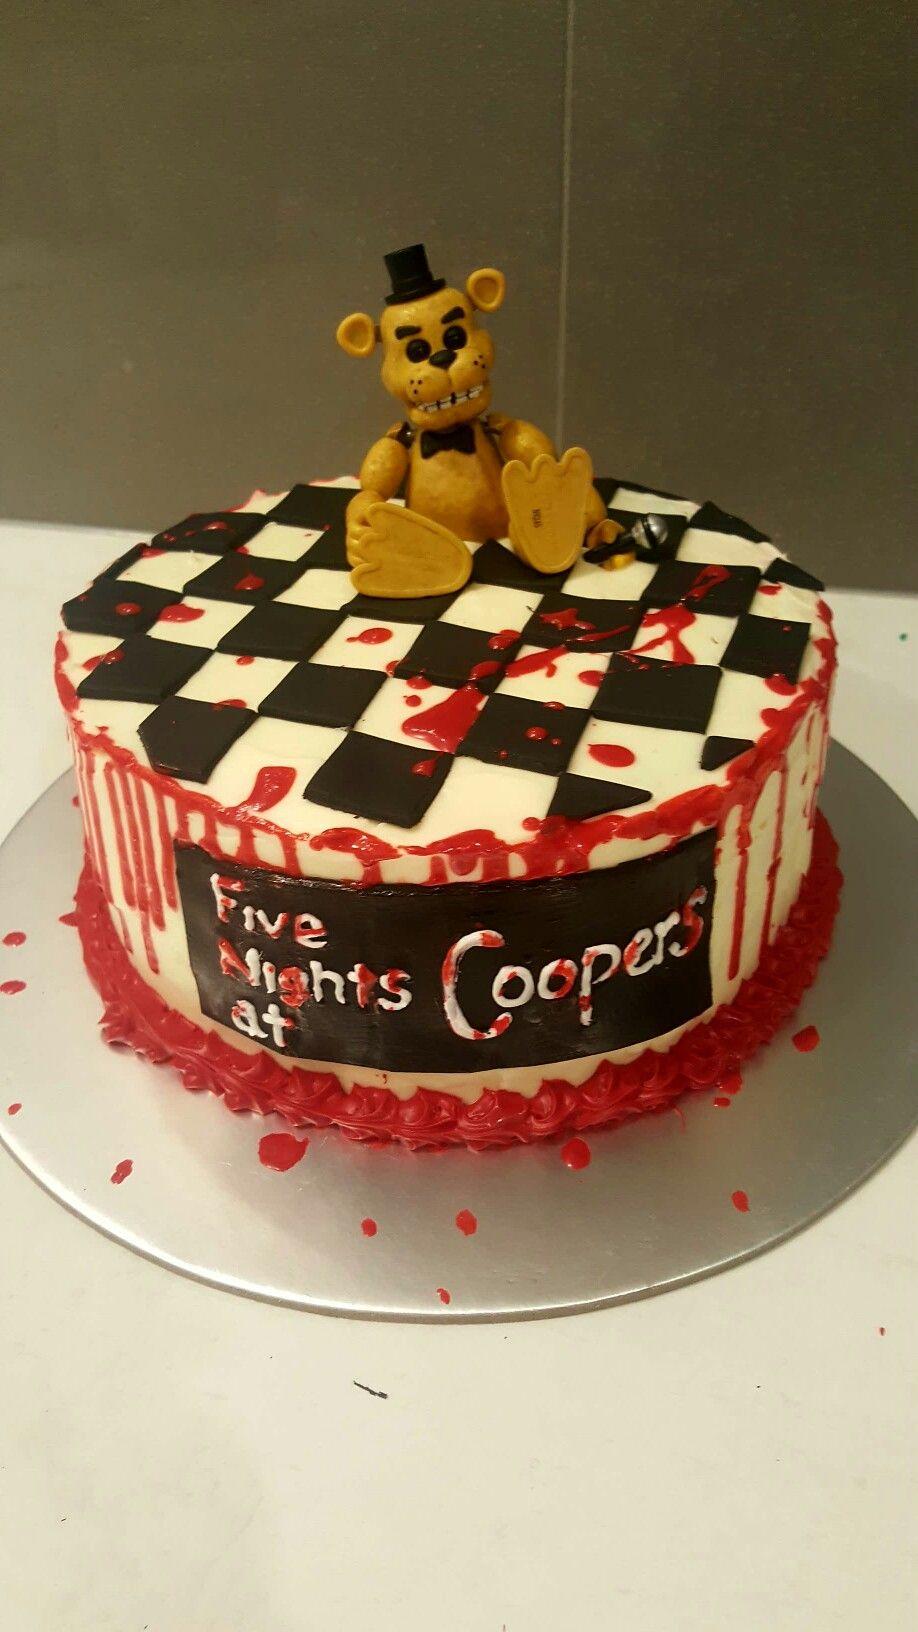 Five nights at freddys cake fnaf cakes birthdays fnaf